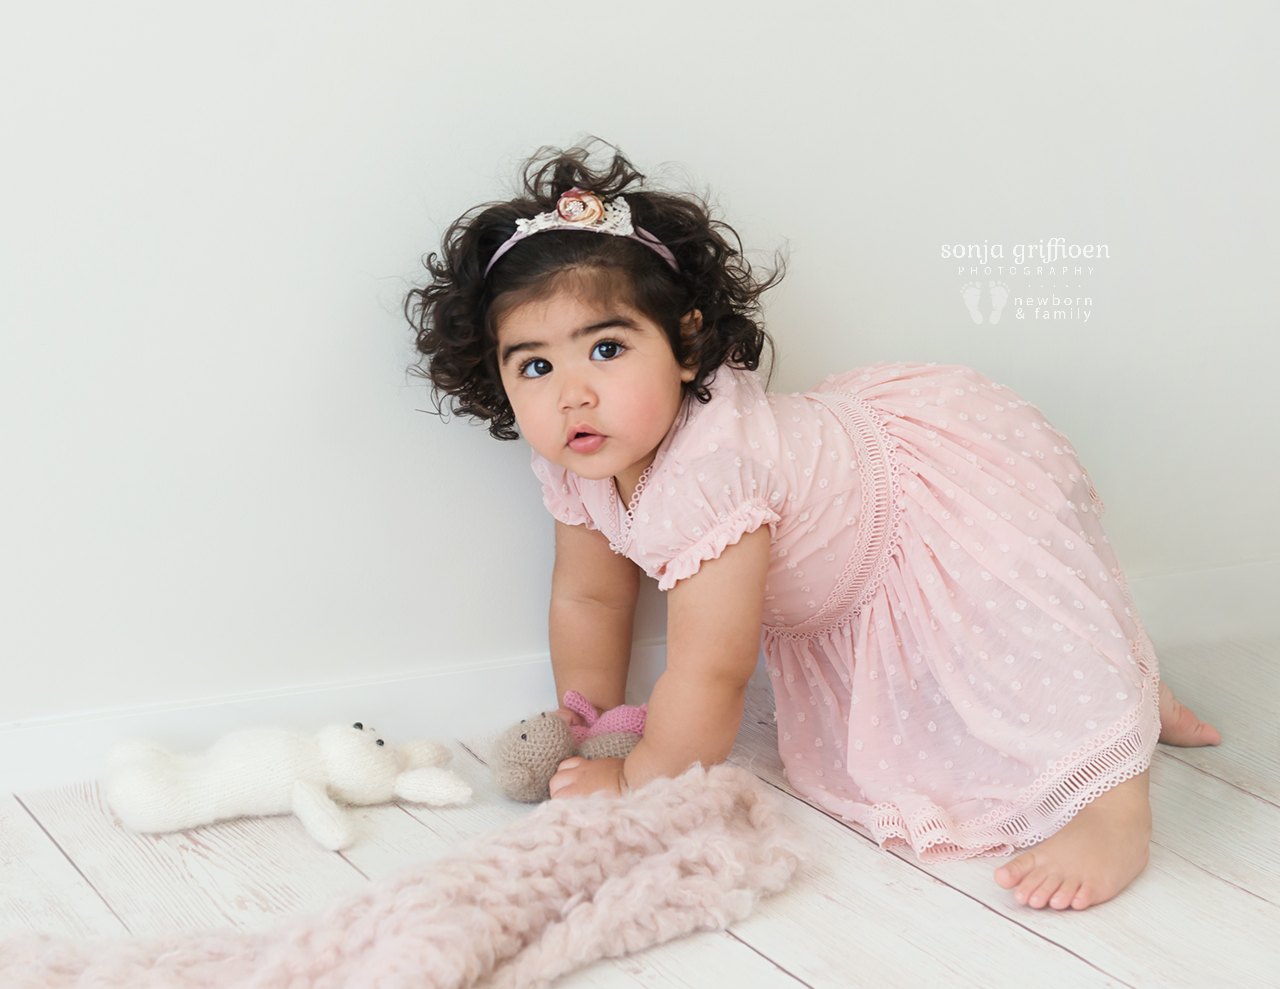 Yara-1-Brisbane-Baby-Photographer-Sonja-Griffioen-07b.jpg